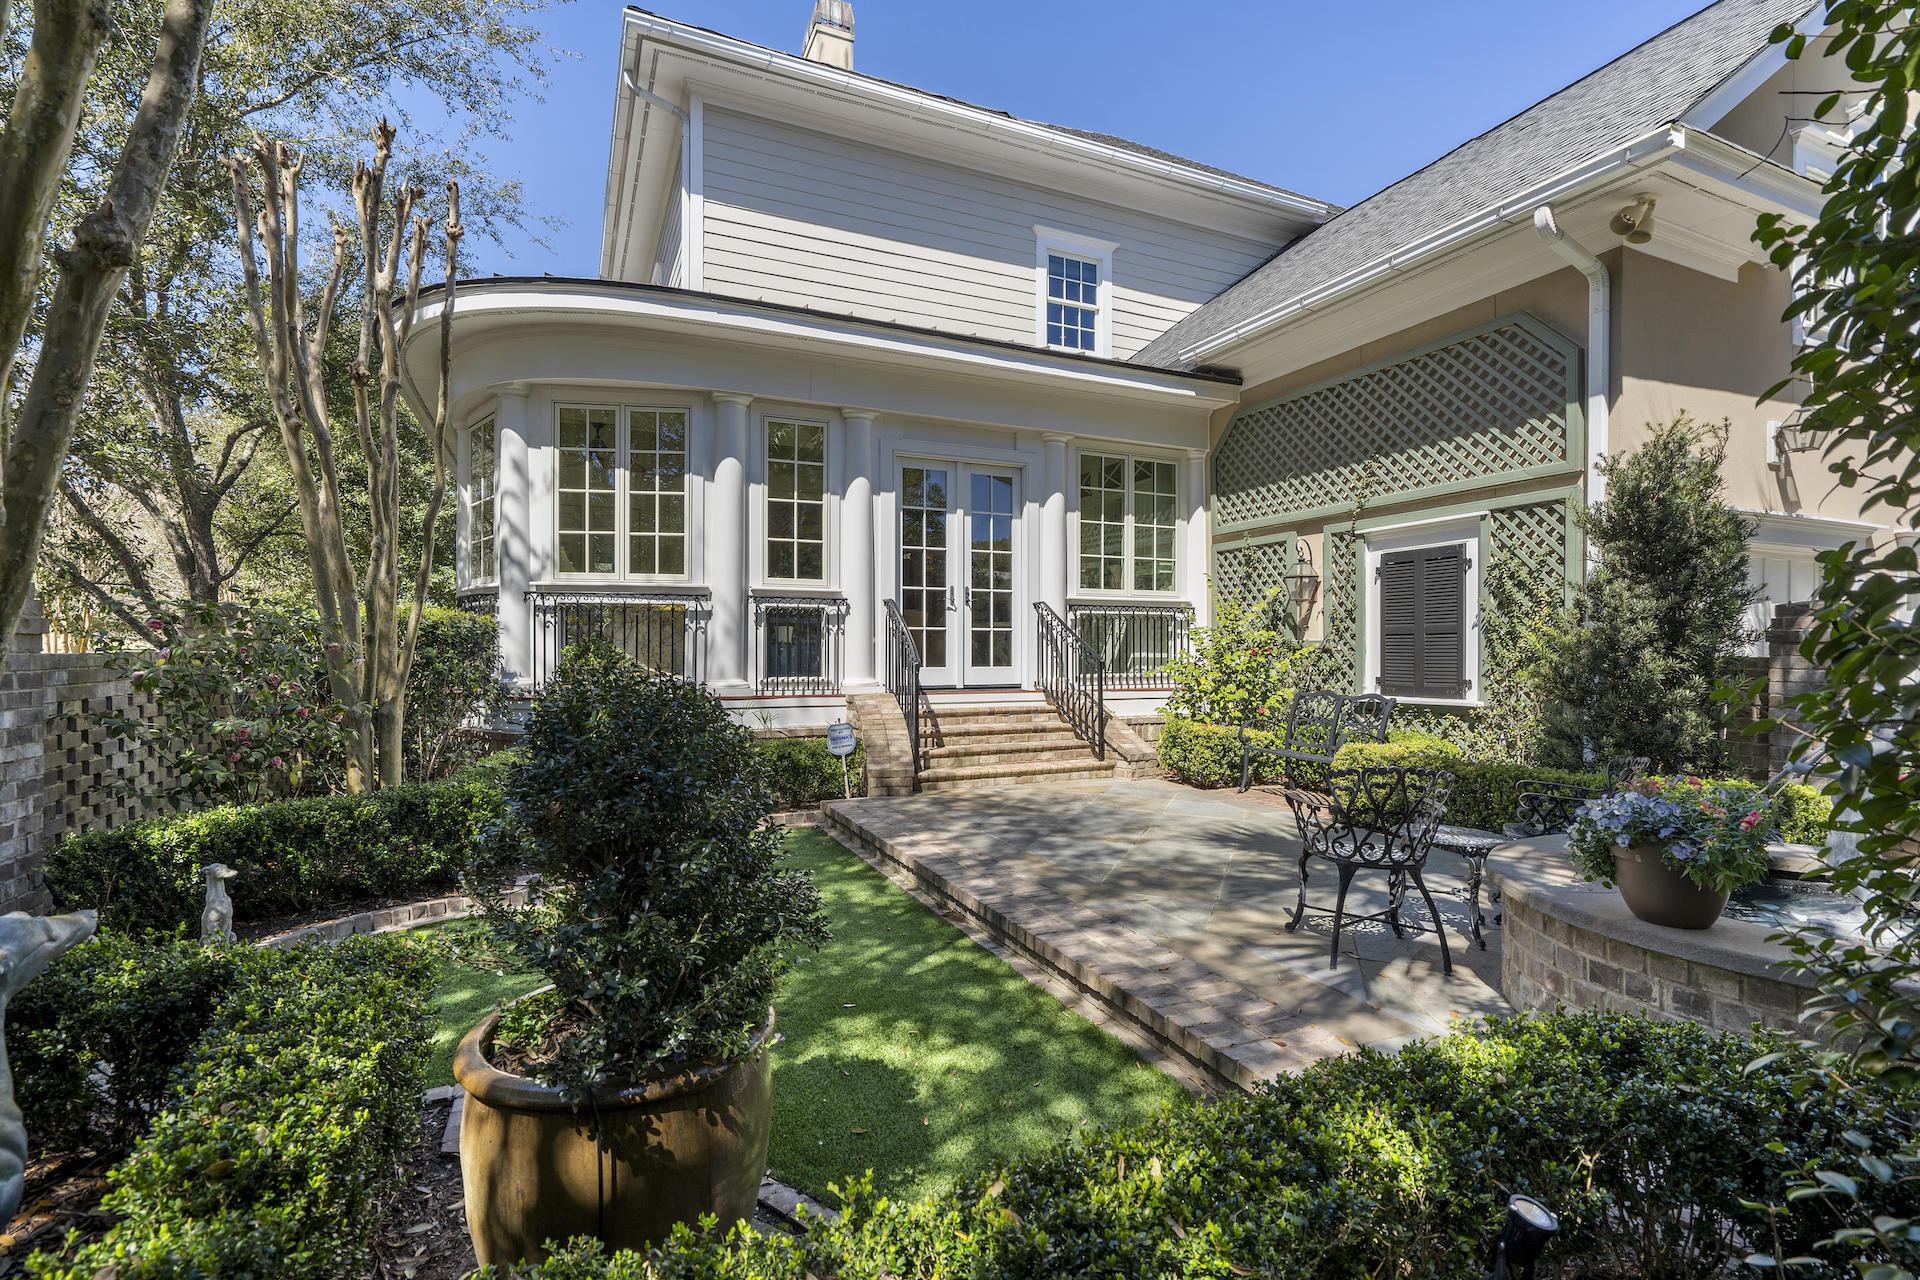 Daniel Island Homes For Sale - 623 Island Park, Charleston, SC - 57